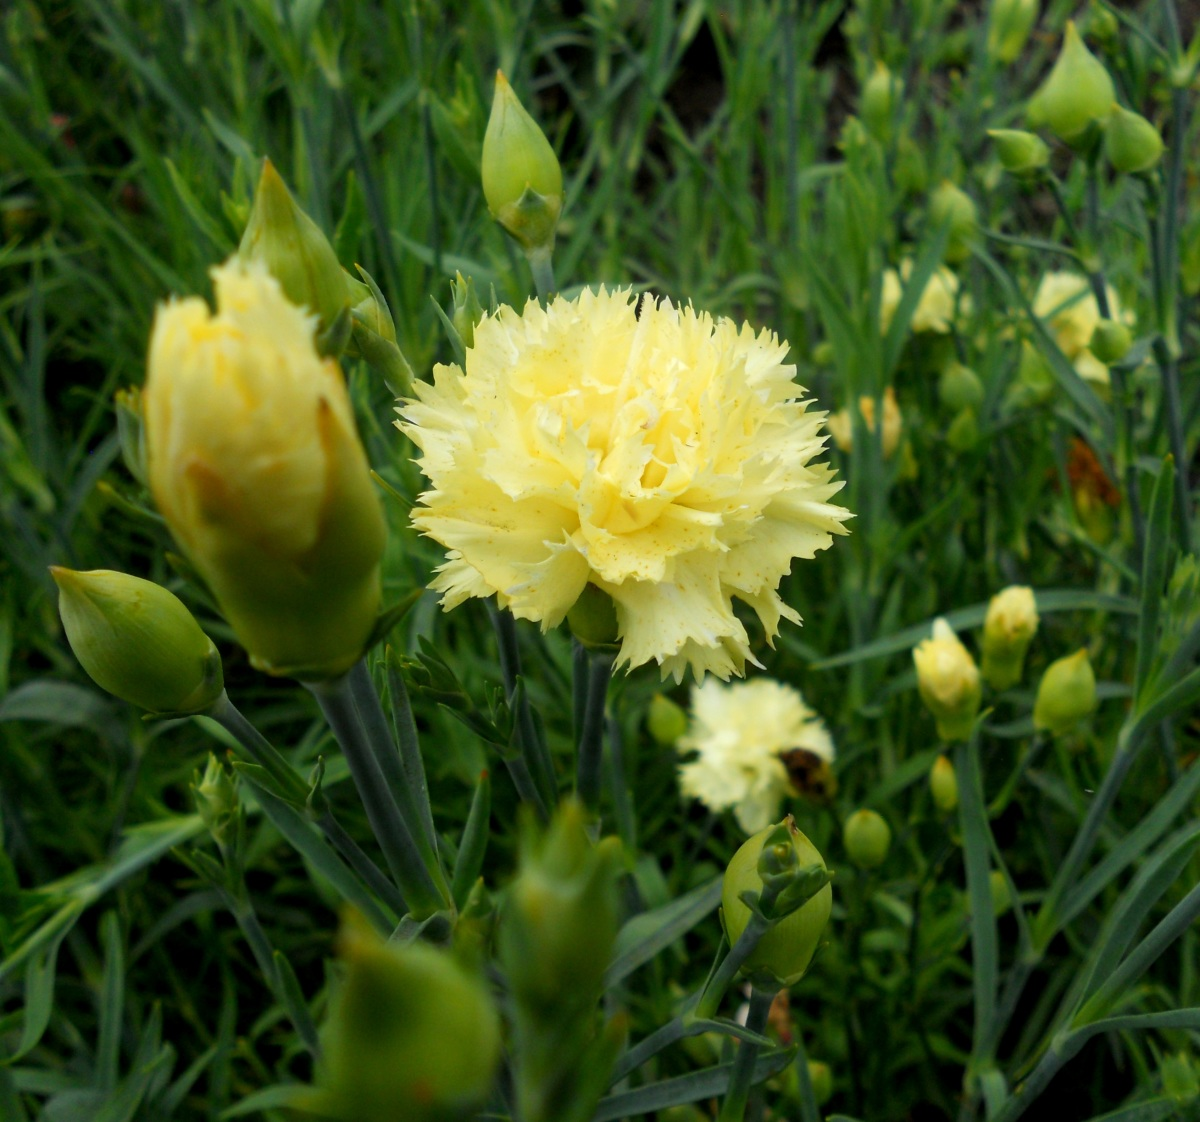 Гвоздика шабо: особенности посадки и ухода, фото цветка